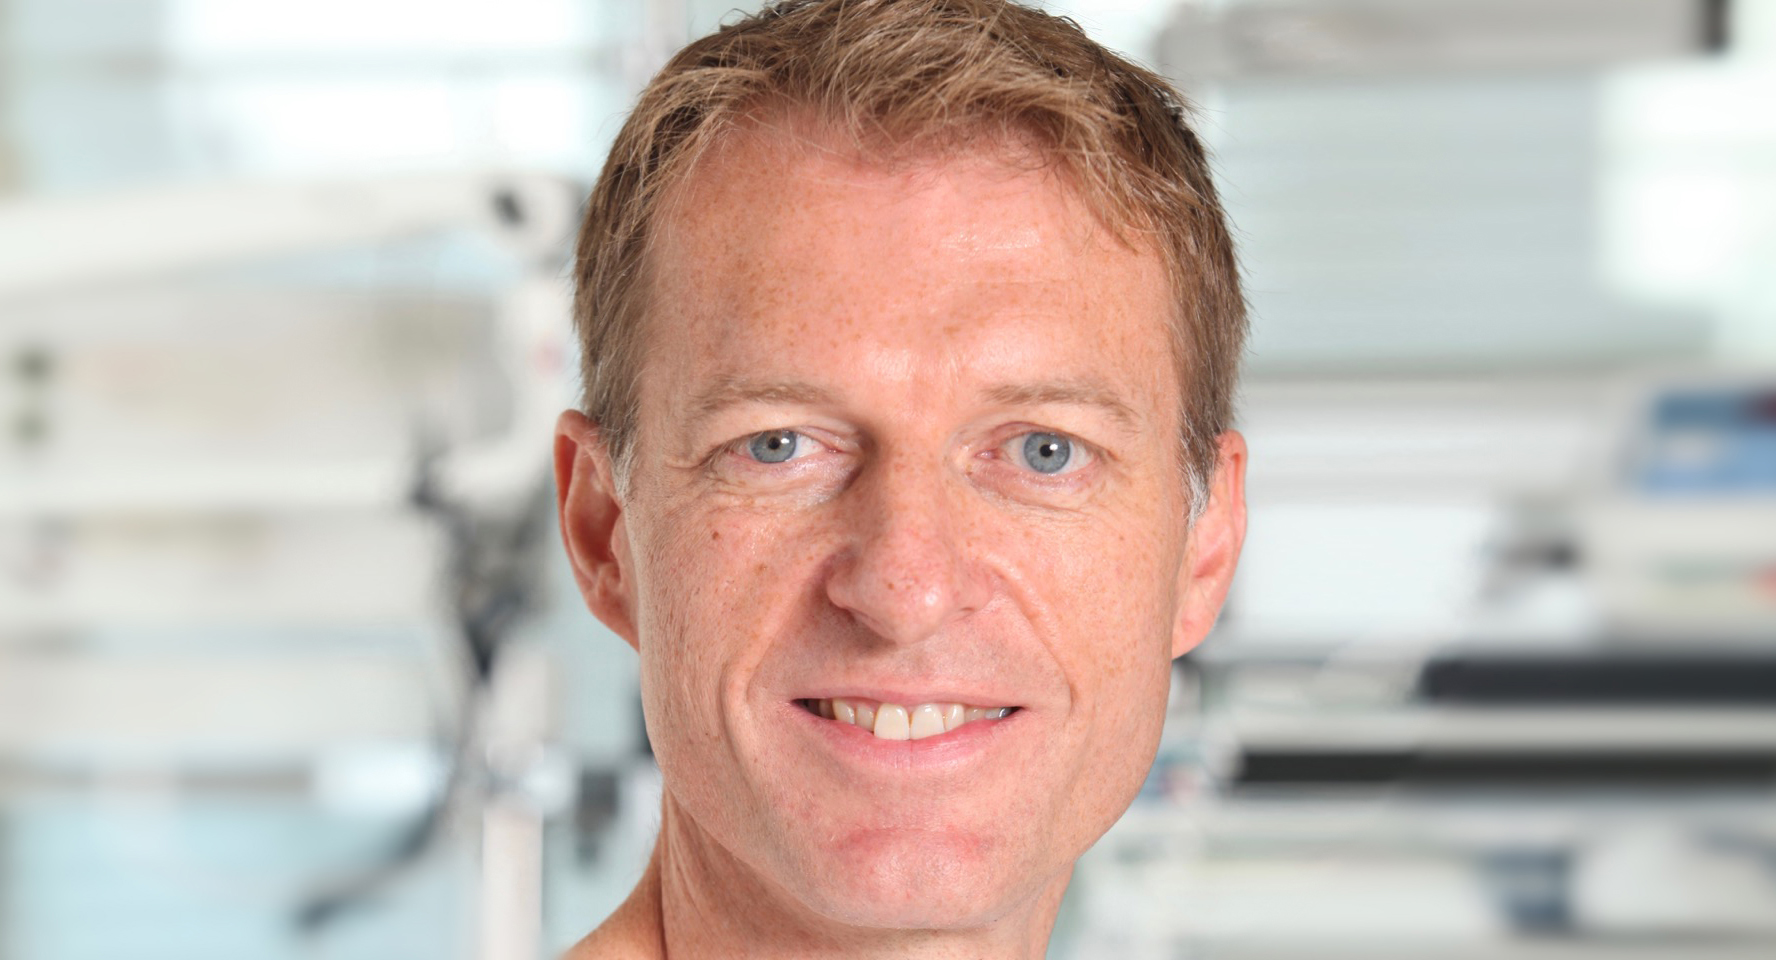 Intensivmediziner PD Dr. med. Markus Béchir, Paraplegigkerzentrum Nottwil LU.